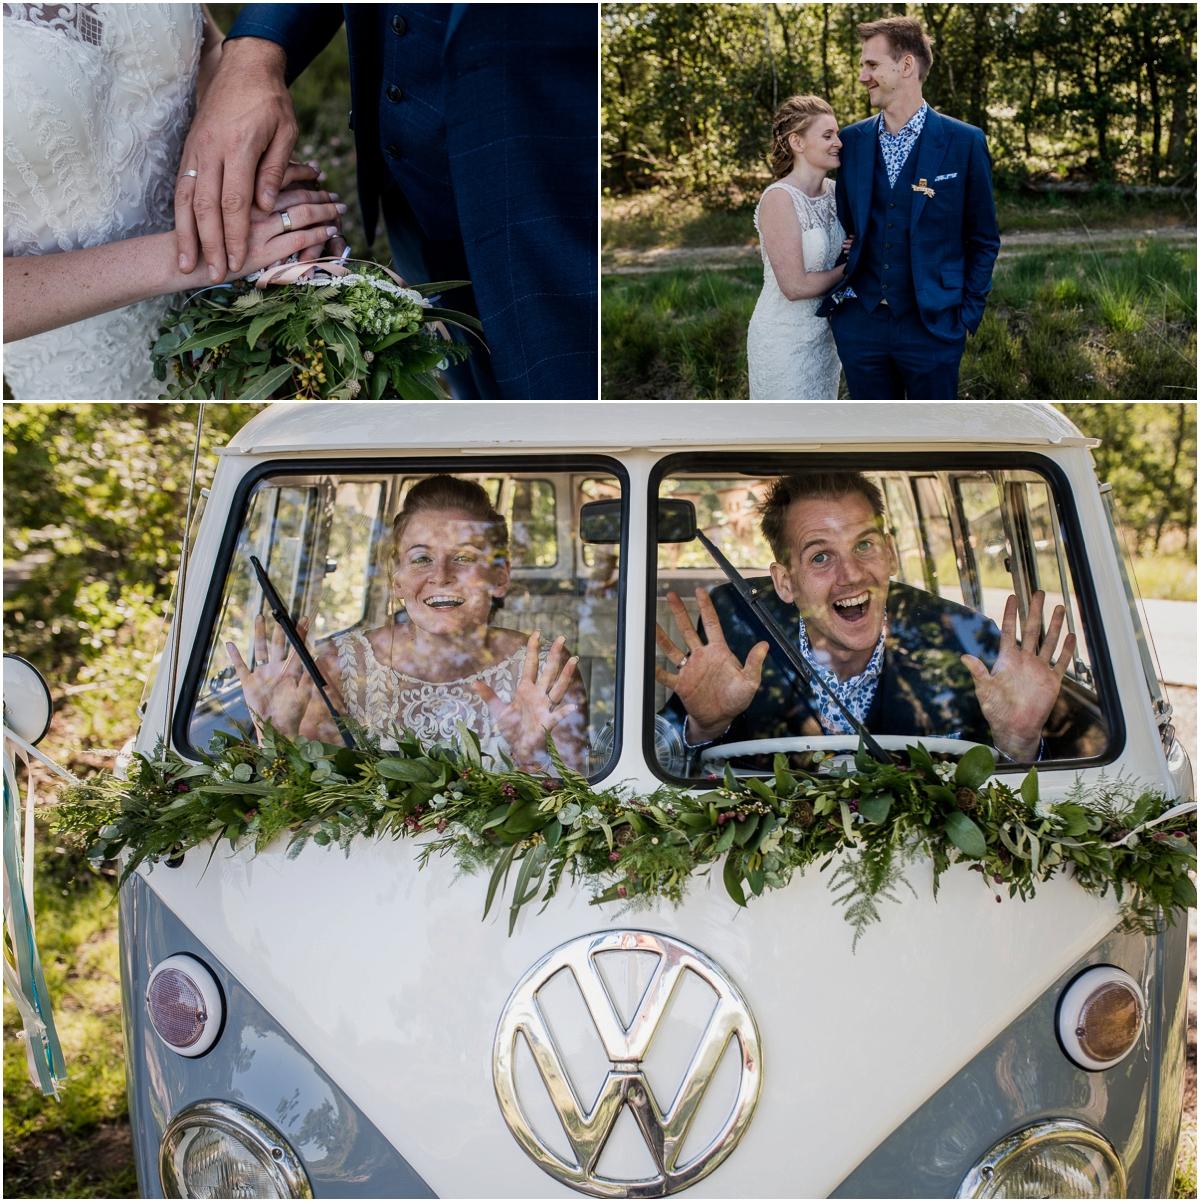 Dayofmylife,bruidsfotografie,prinschenhoeve,zomerse bruiloft,13